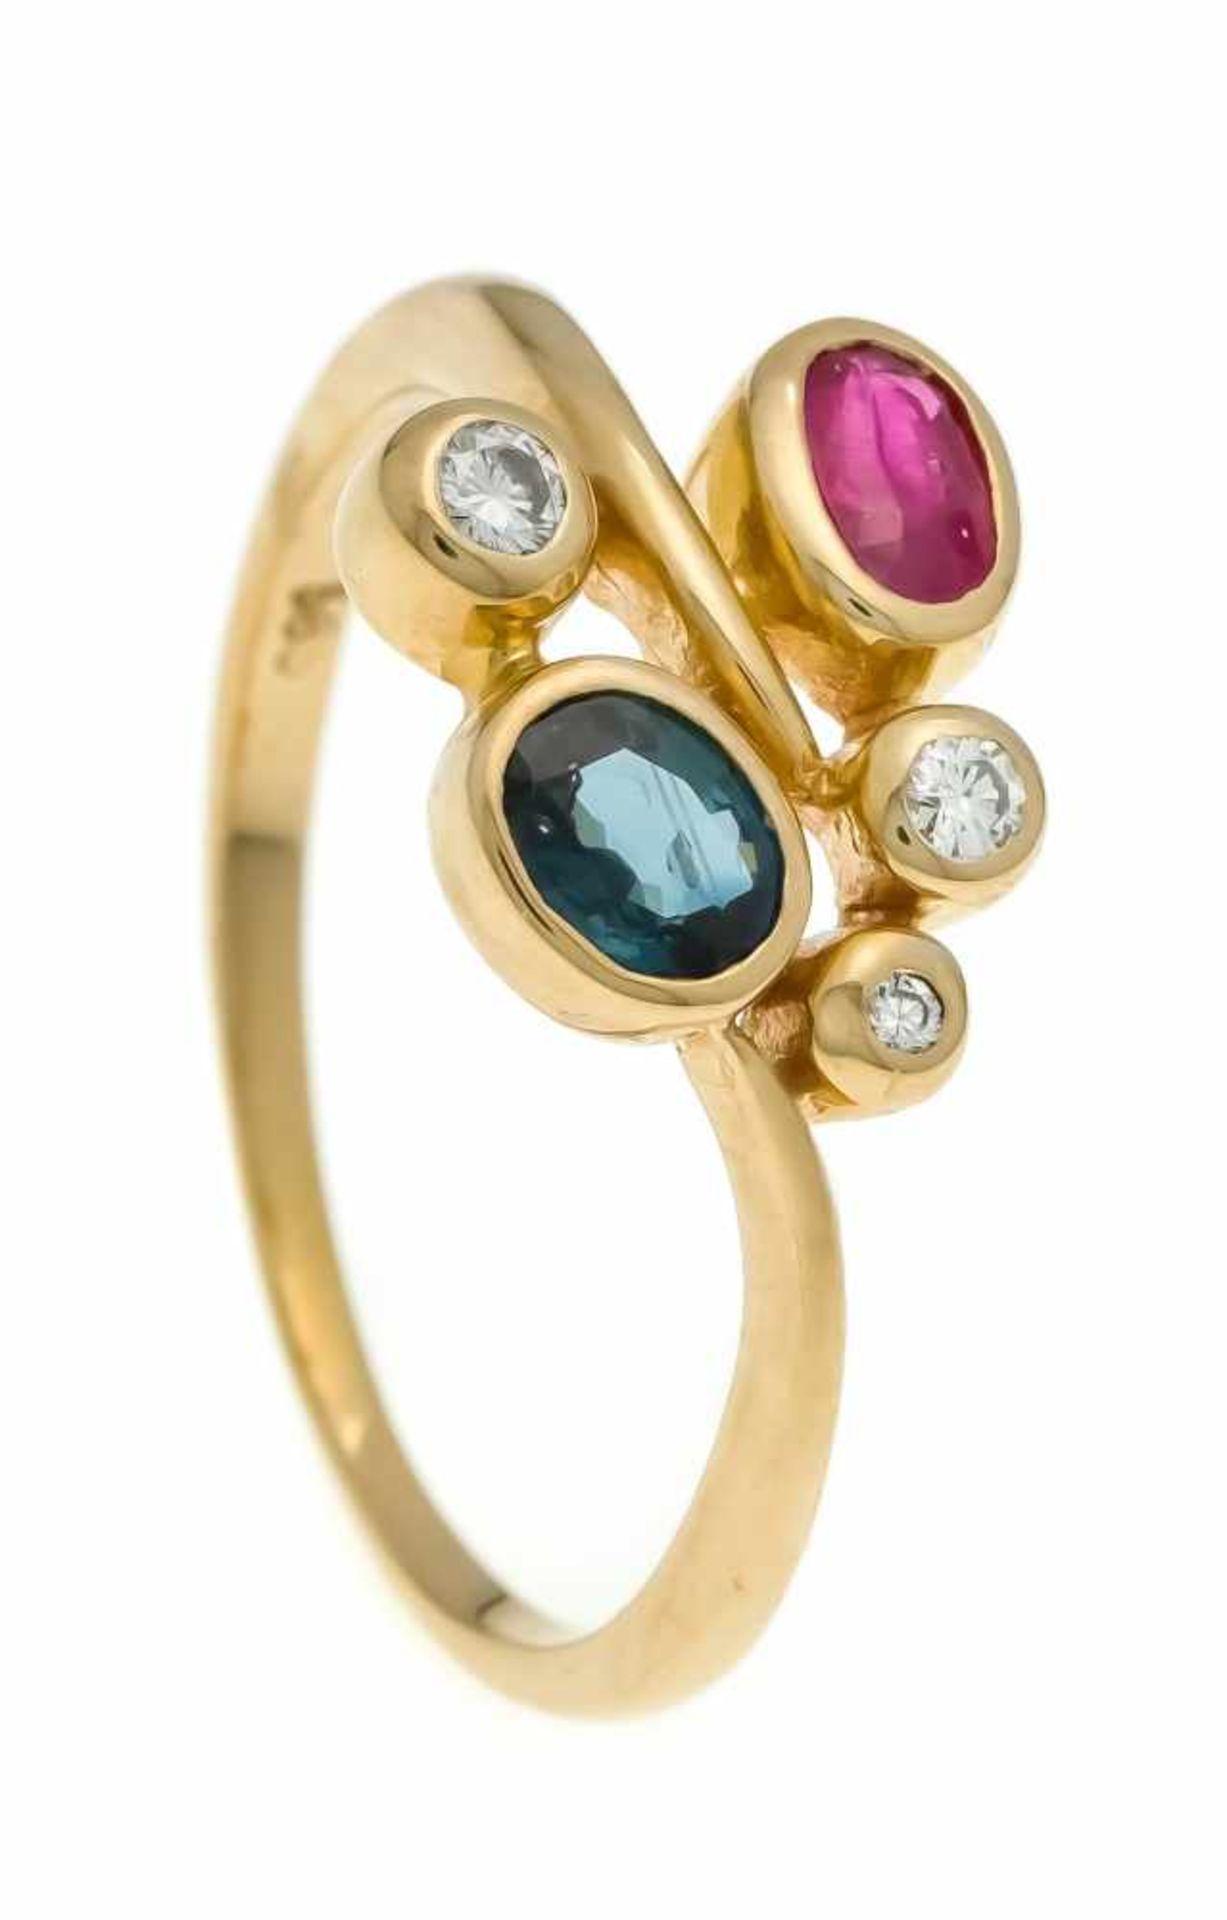 Rubin-Saphir-Brillant-Ring RG 585/000 mit je einem oval fac. Rubin 4,8 x 3,2 mm, Saphir 4,9 x 4,0 mm